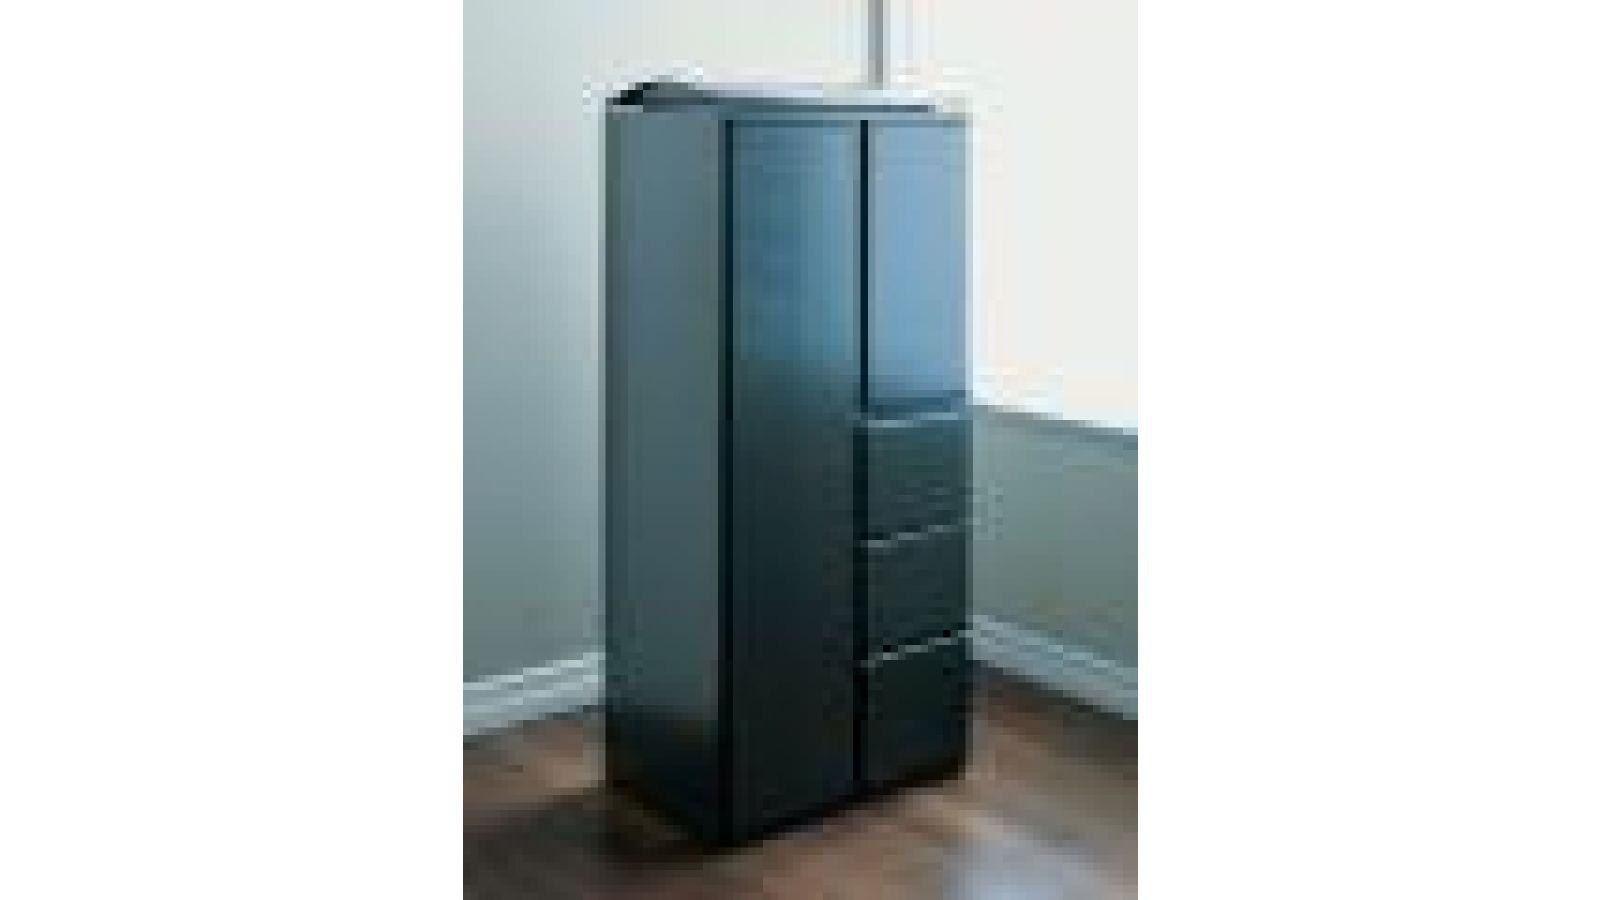 Office Specialty¢â€ž¢ Storage Towers